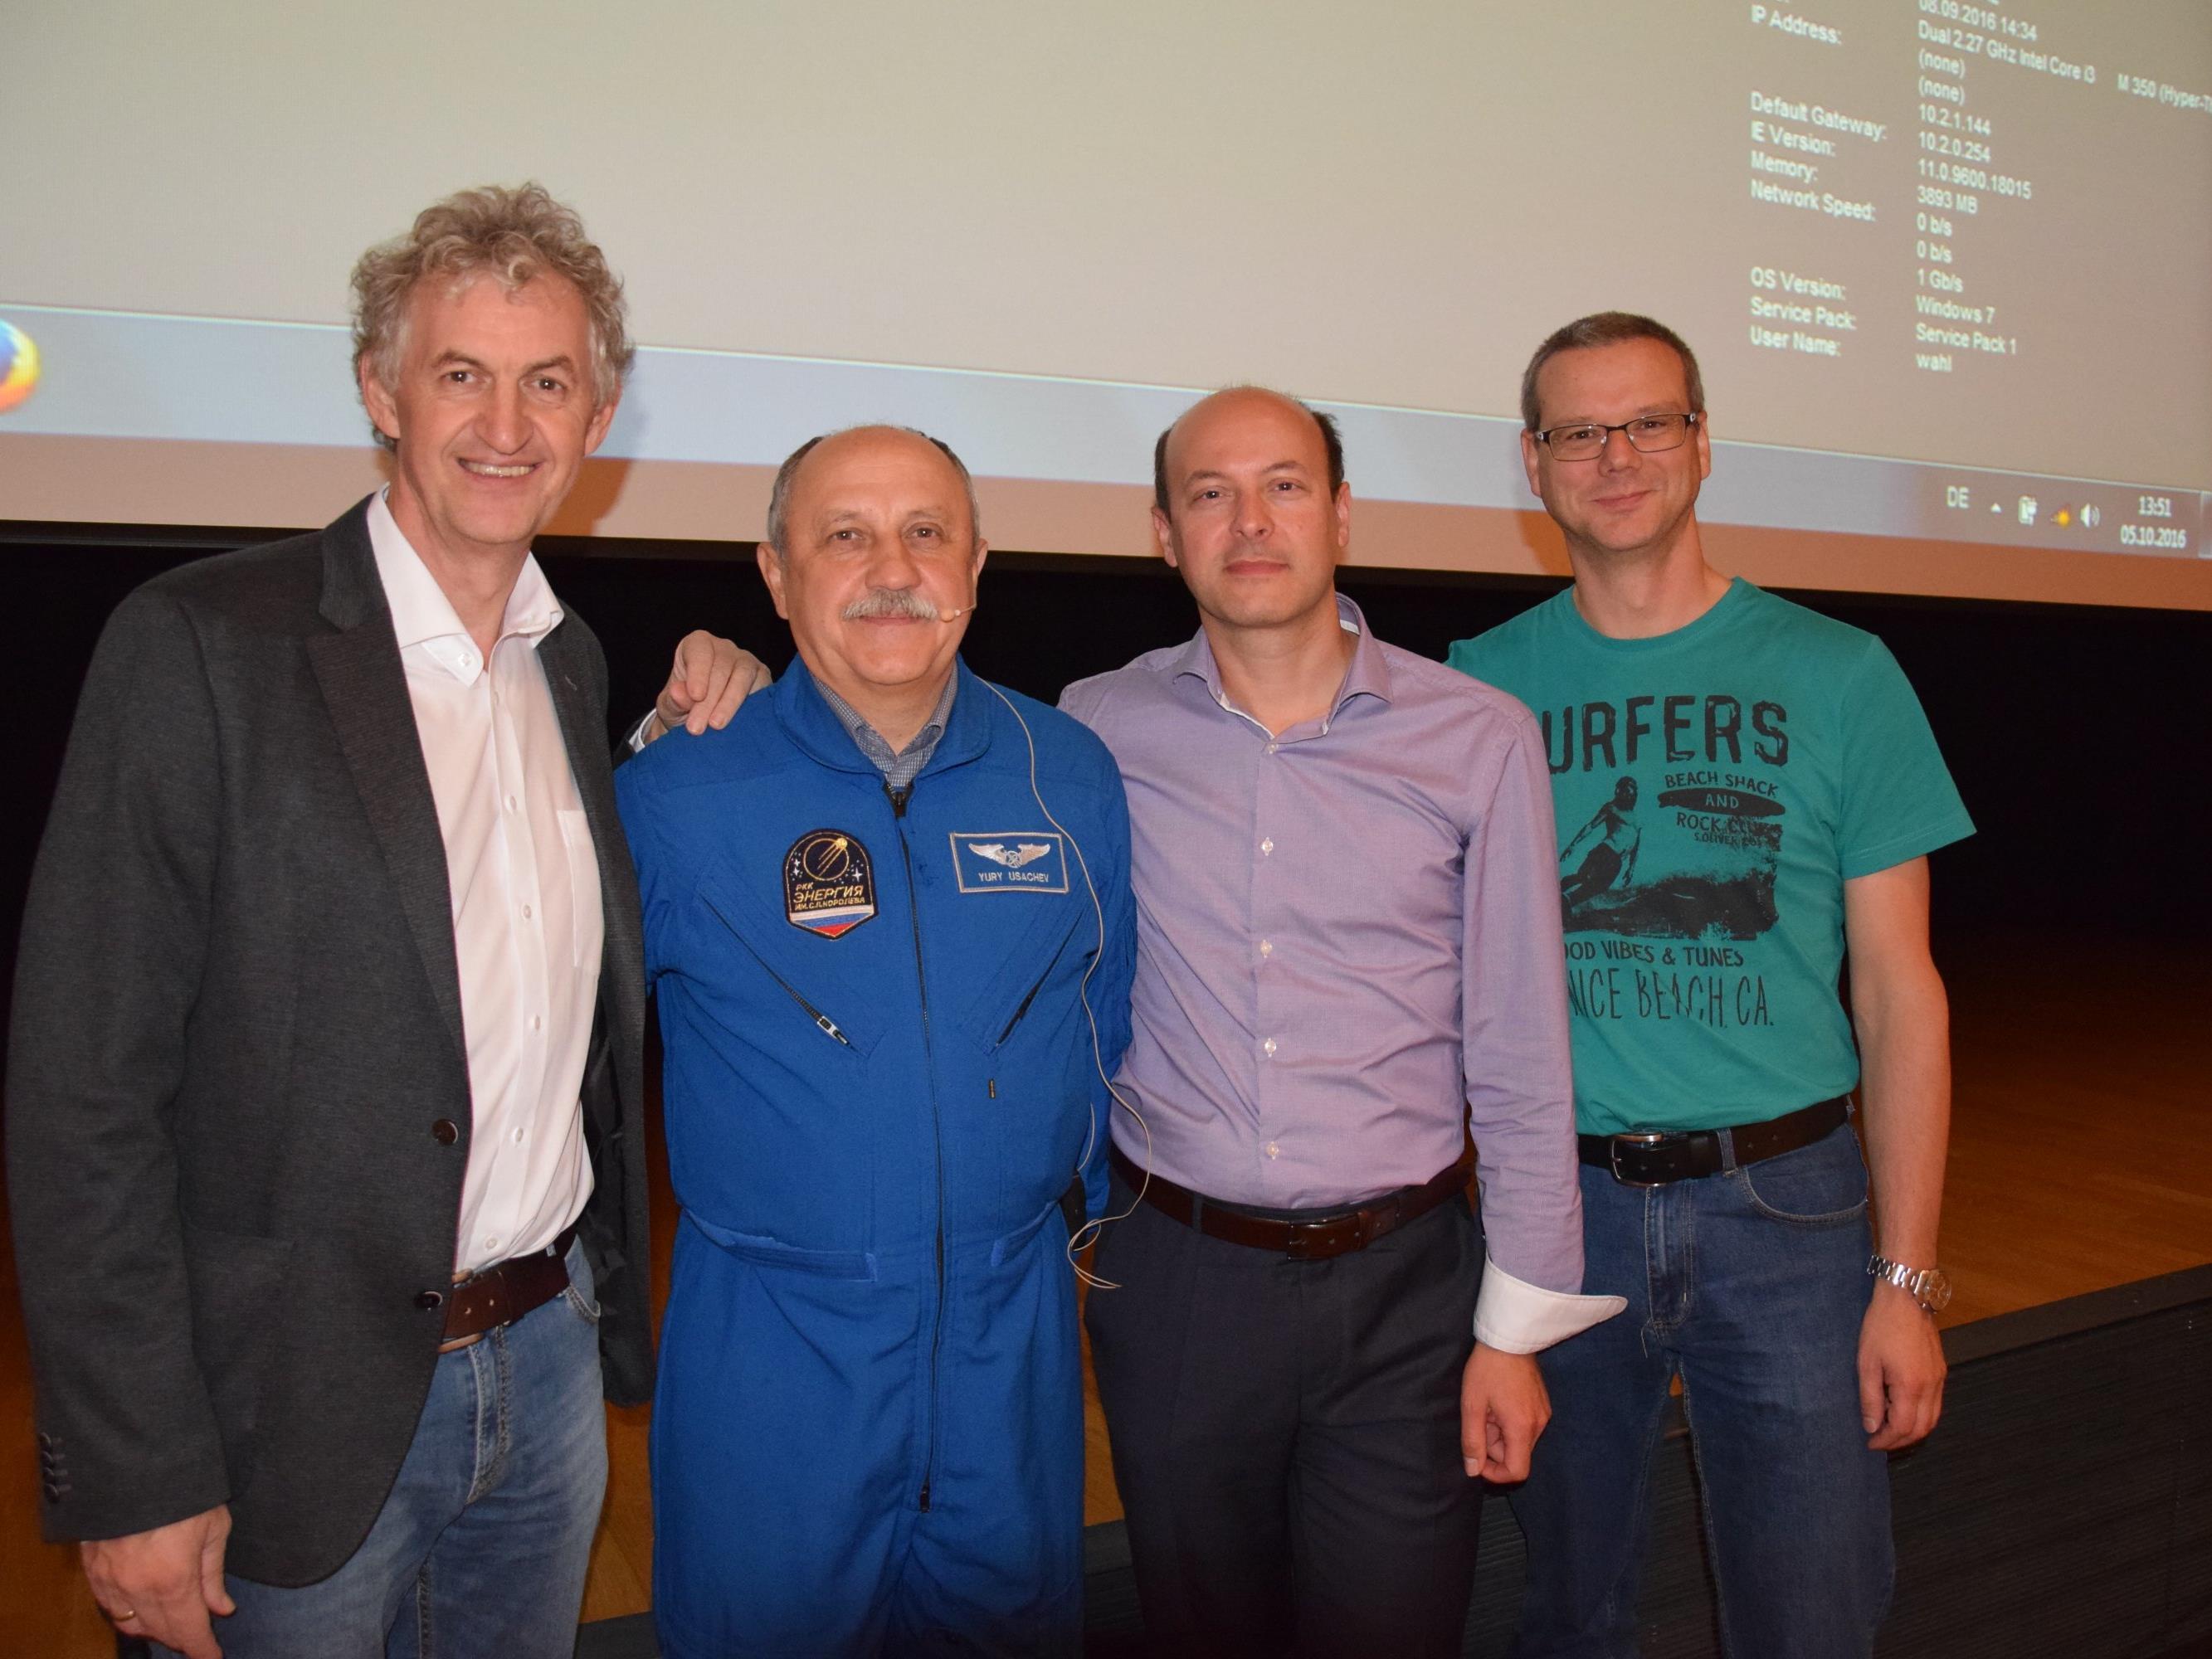 v.l.n.r. Dir. Edgar Natter, Kosmonaut Juri Ussatschow, Harald Fauland (Österr. Weltraum Forum), Kuno Sandholzer